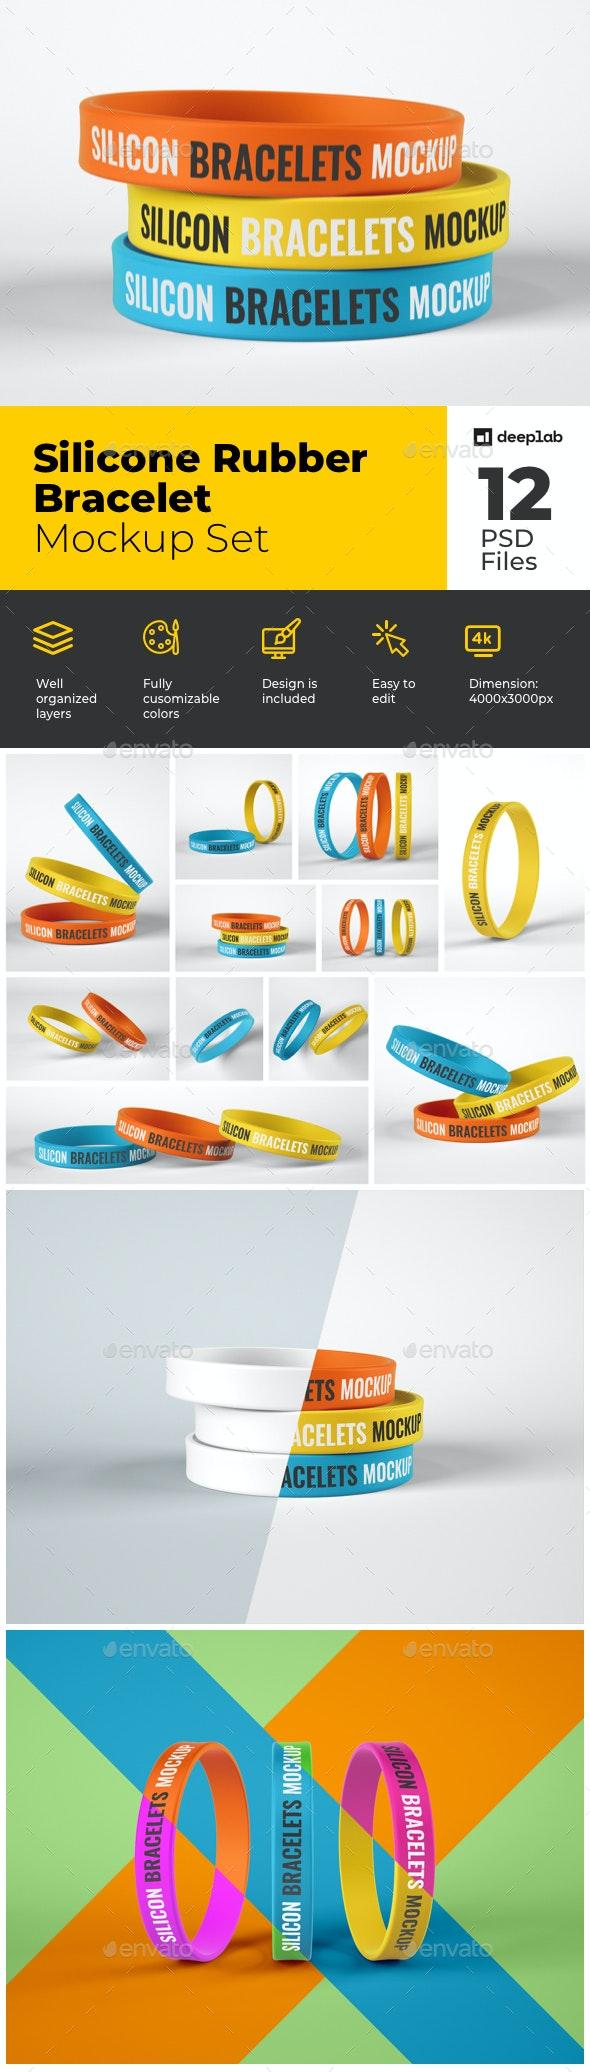 Silicone Rubber Bracelet Mockup Set - Product Mock-Ups Graphics